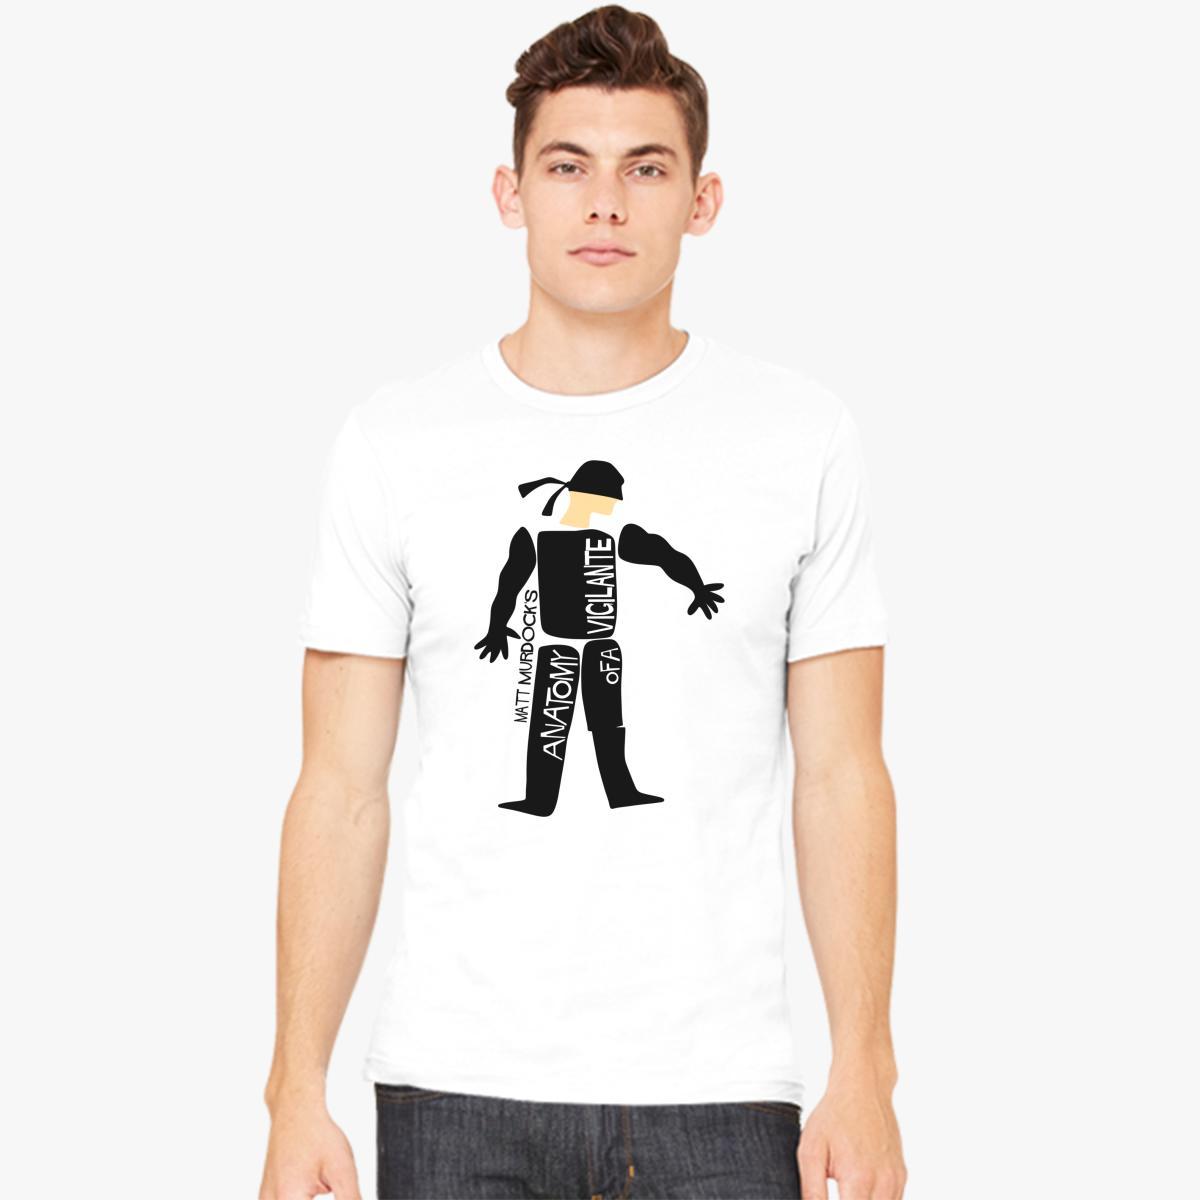 Anatomy of a Vigilante Men\'s T-shirt | Customon.com